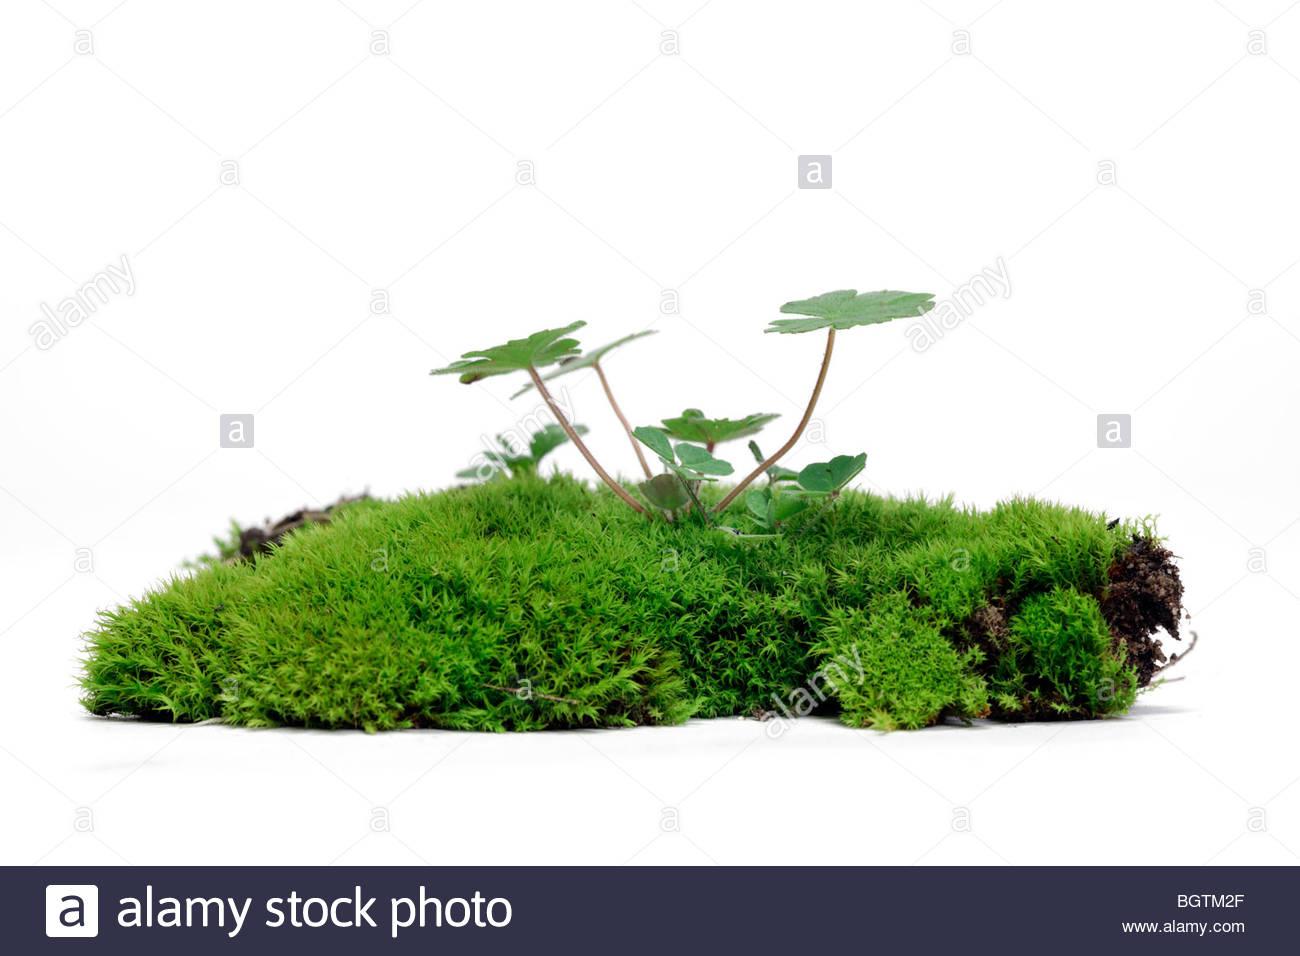 Fresh green moss avec sprouting jeunes graminées Photo Stock